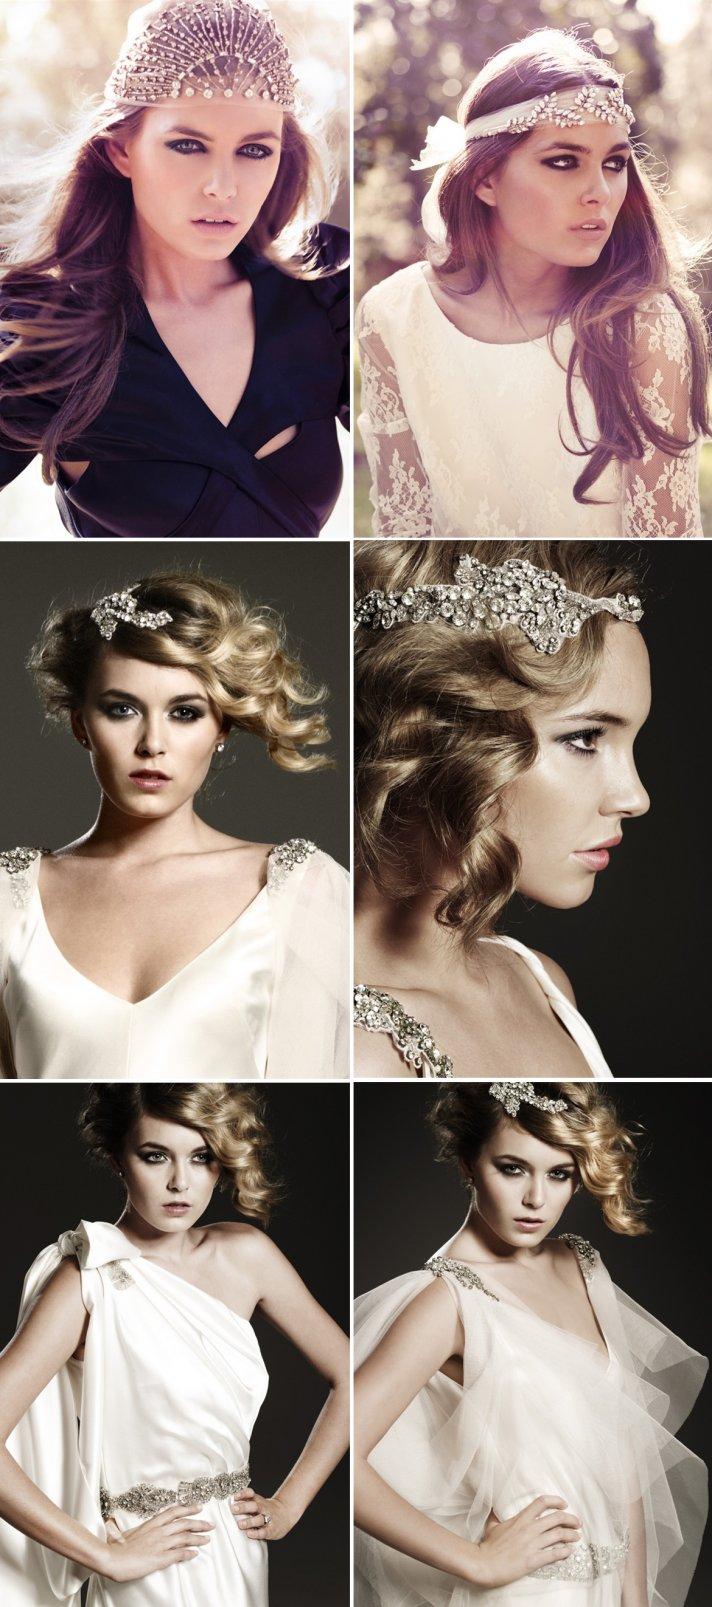 bridal hair accessories wedding caps veils tiaras 2012